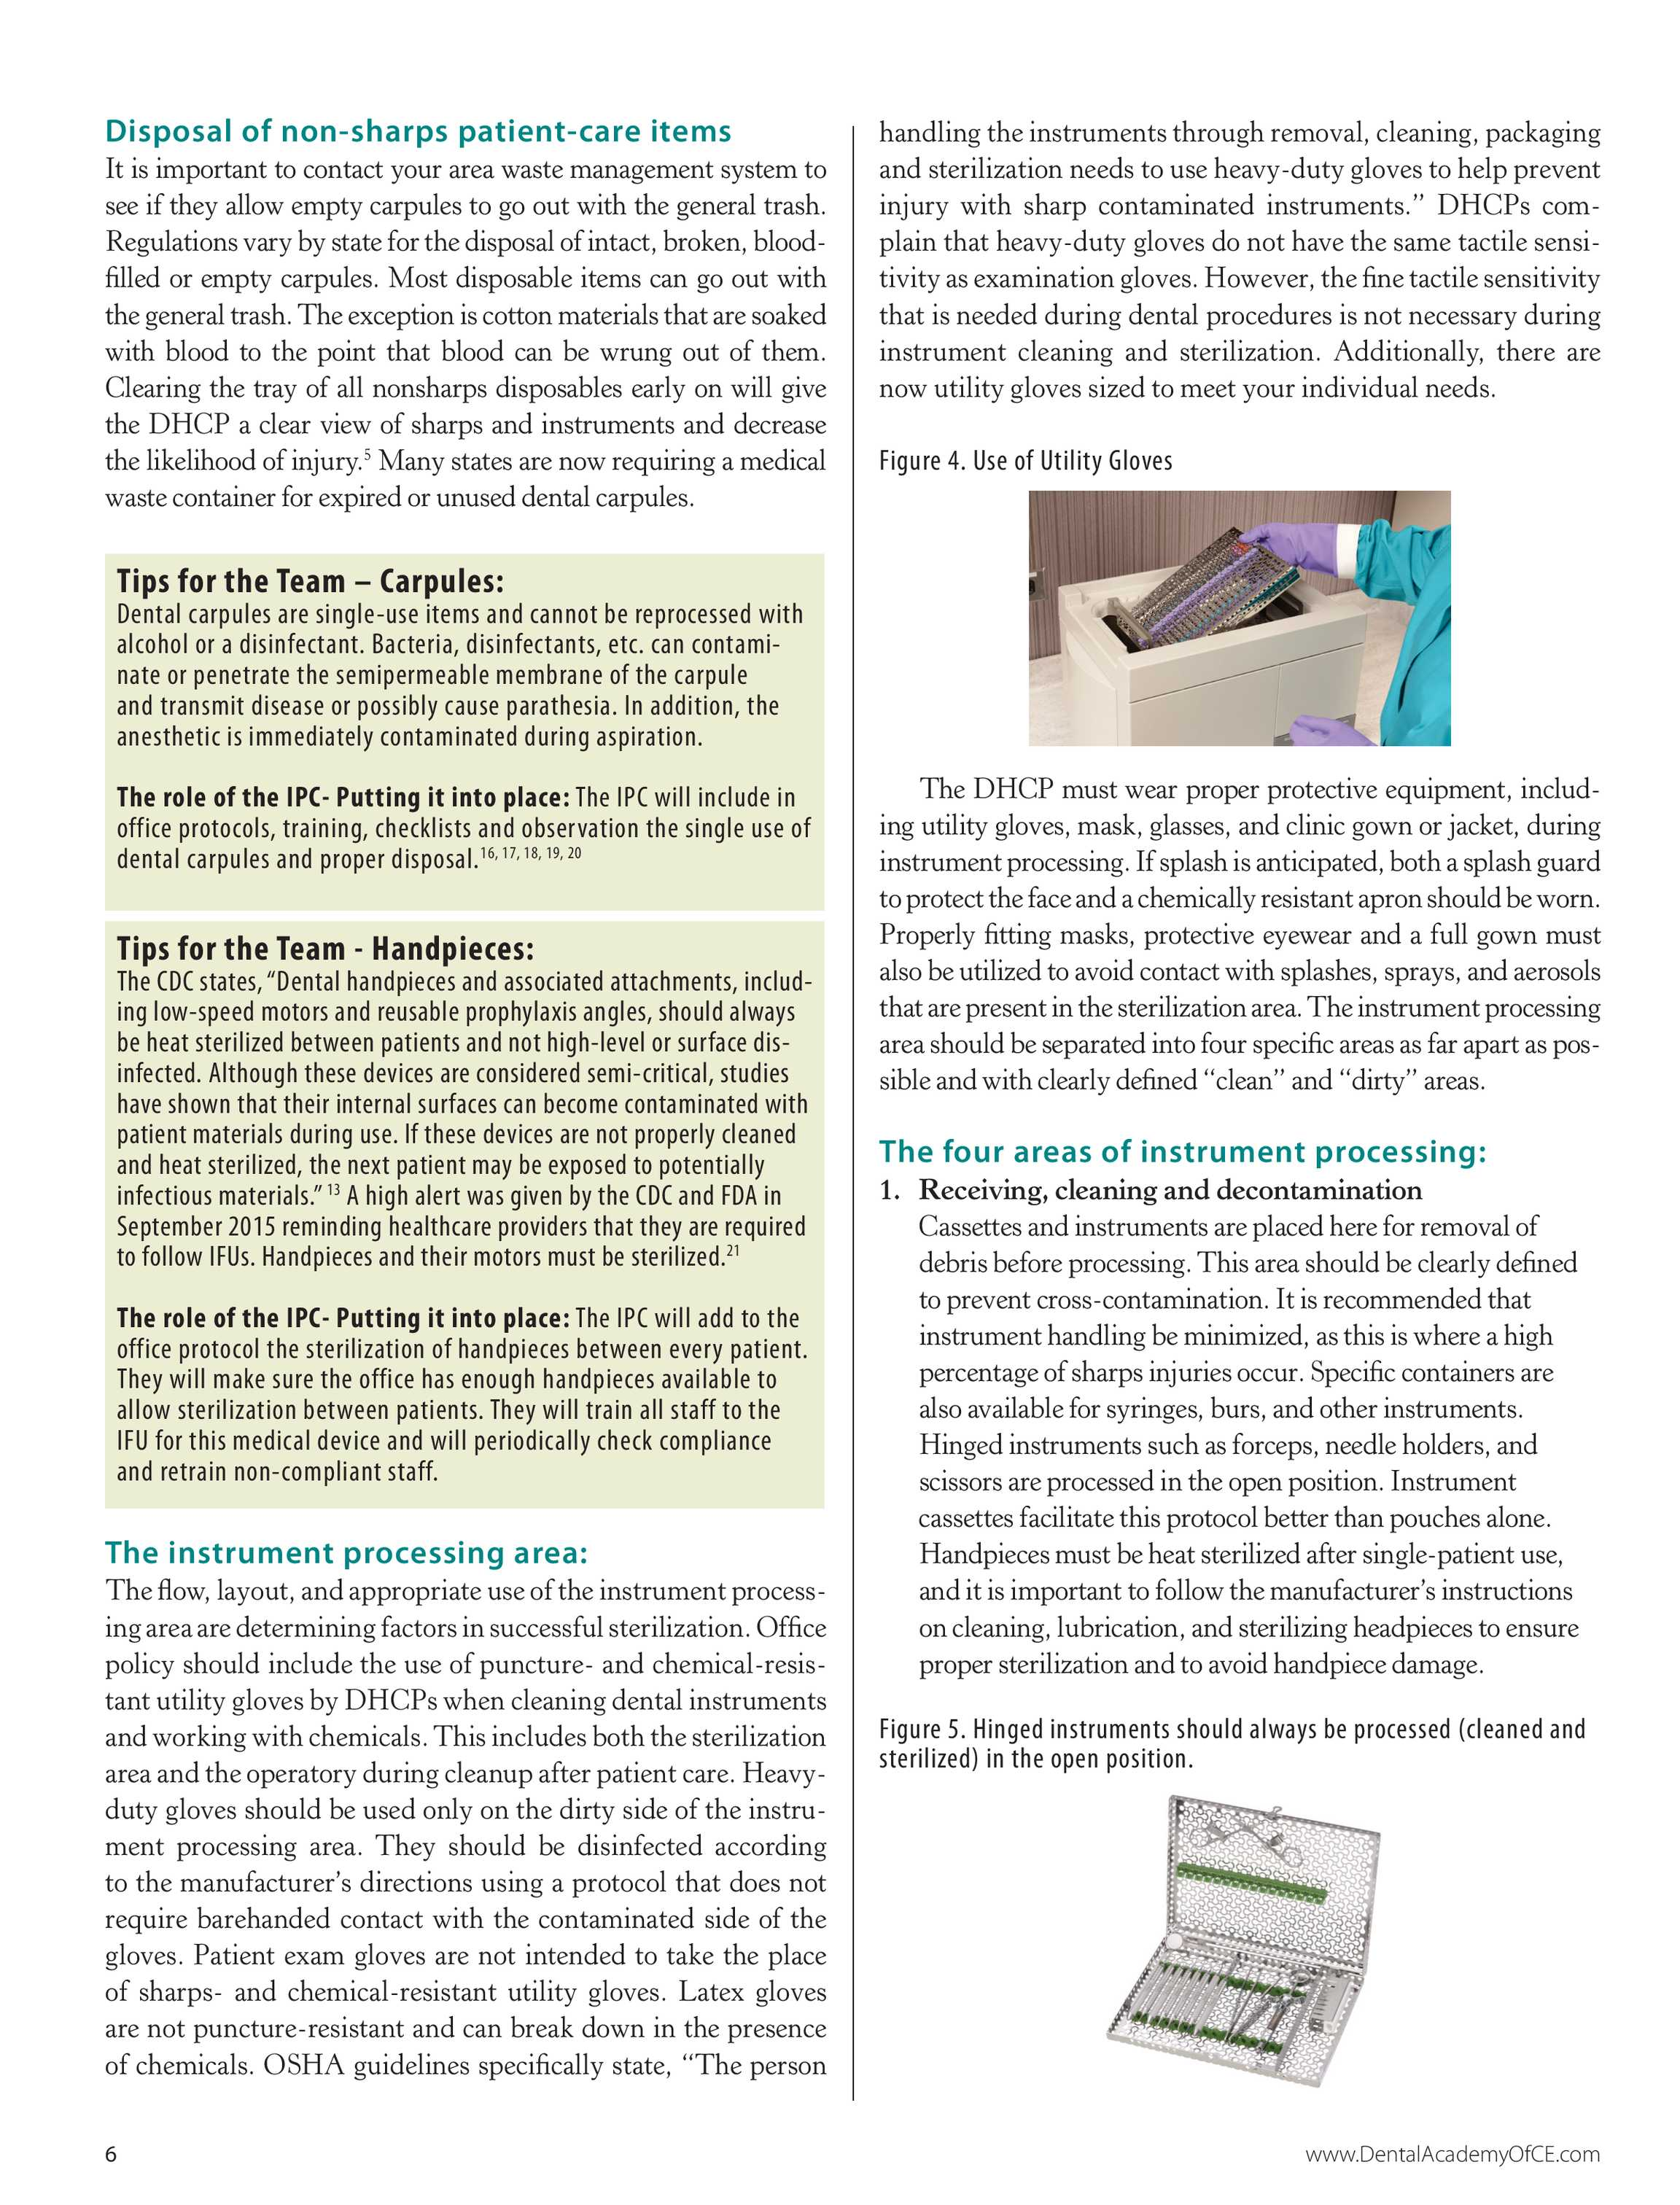 Dental Economics - November 2016 - page HF6